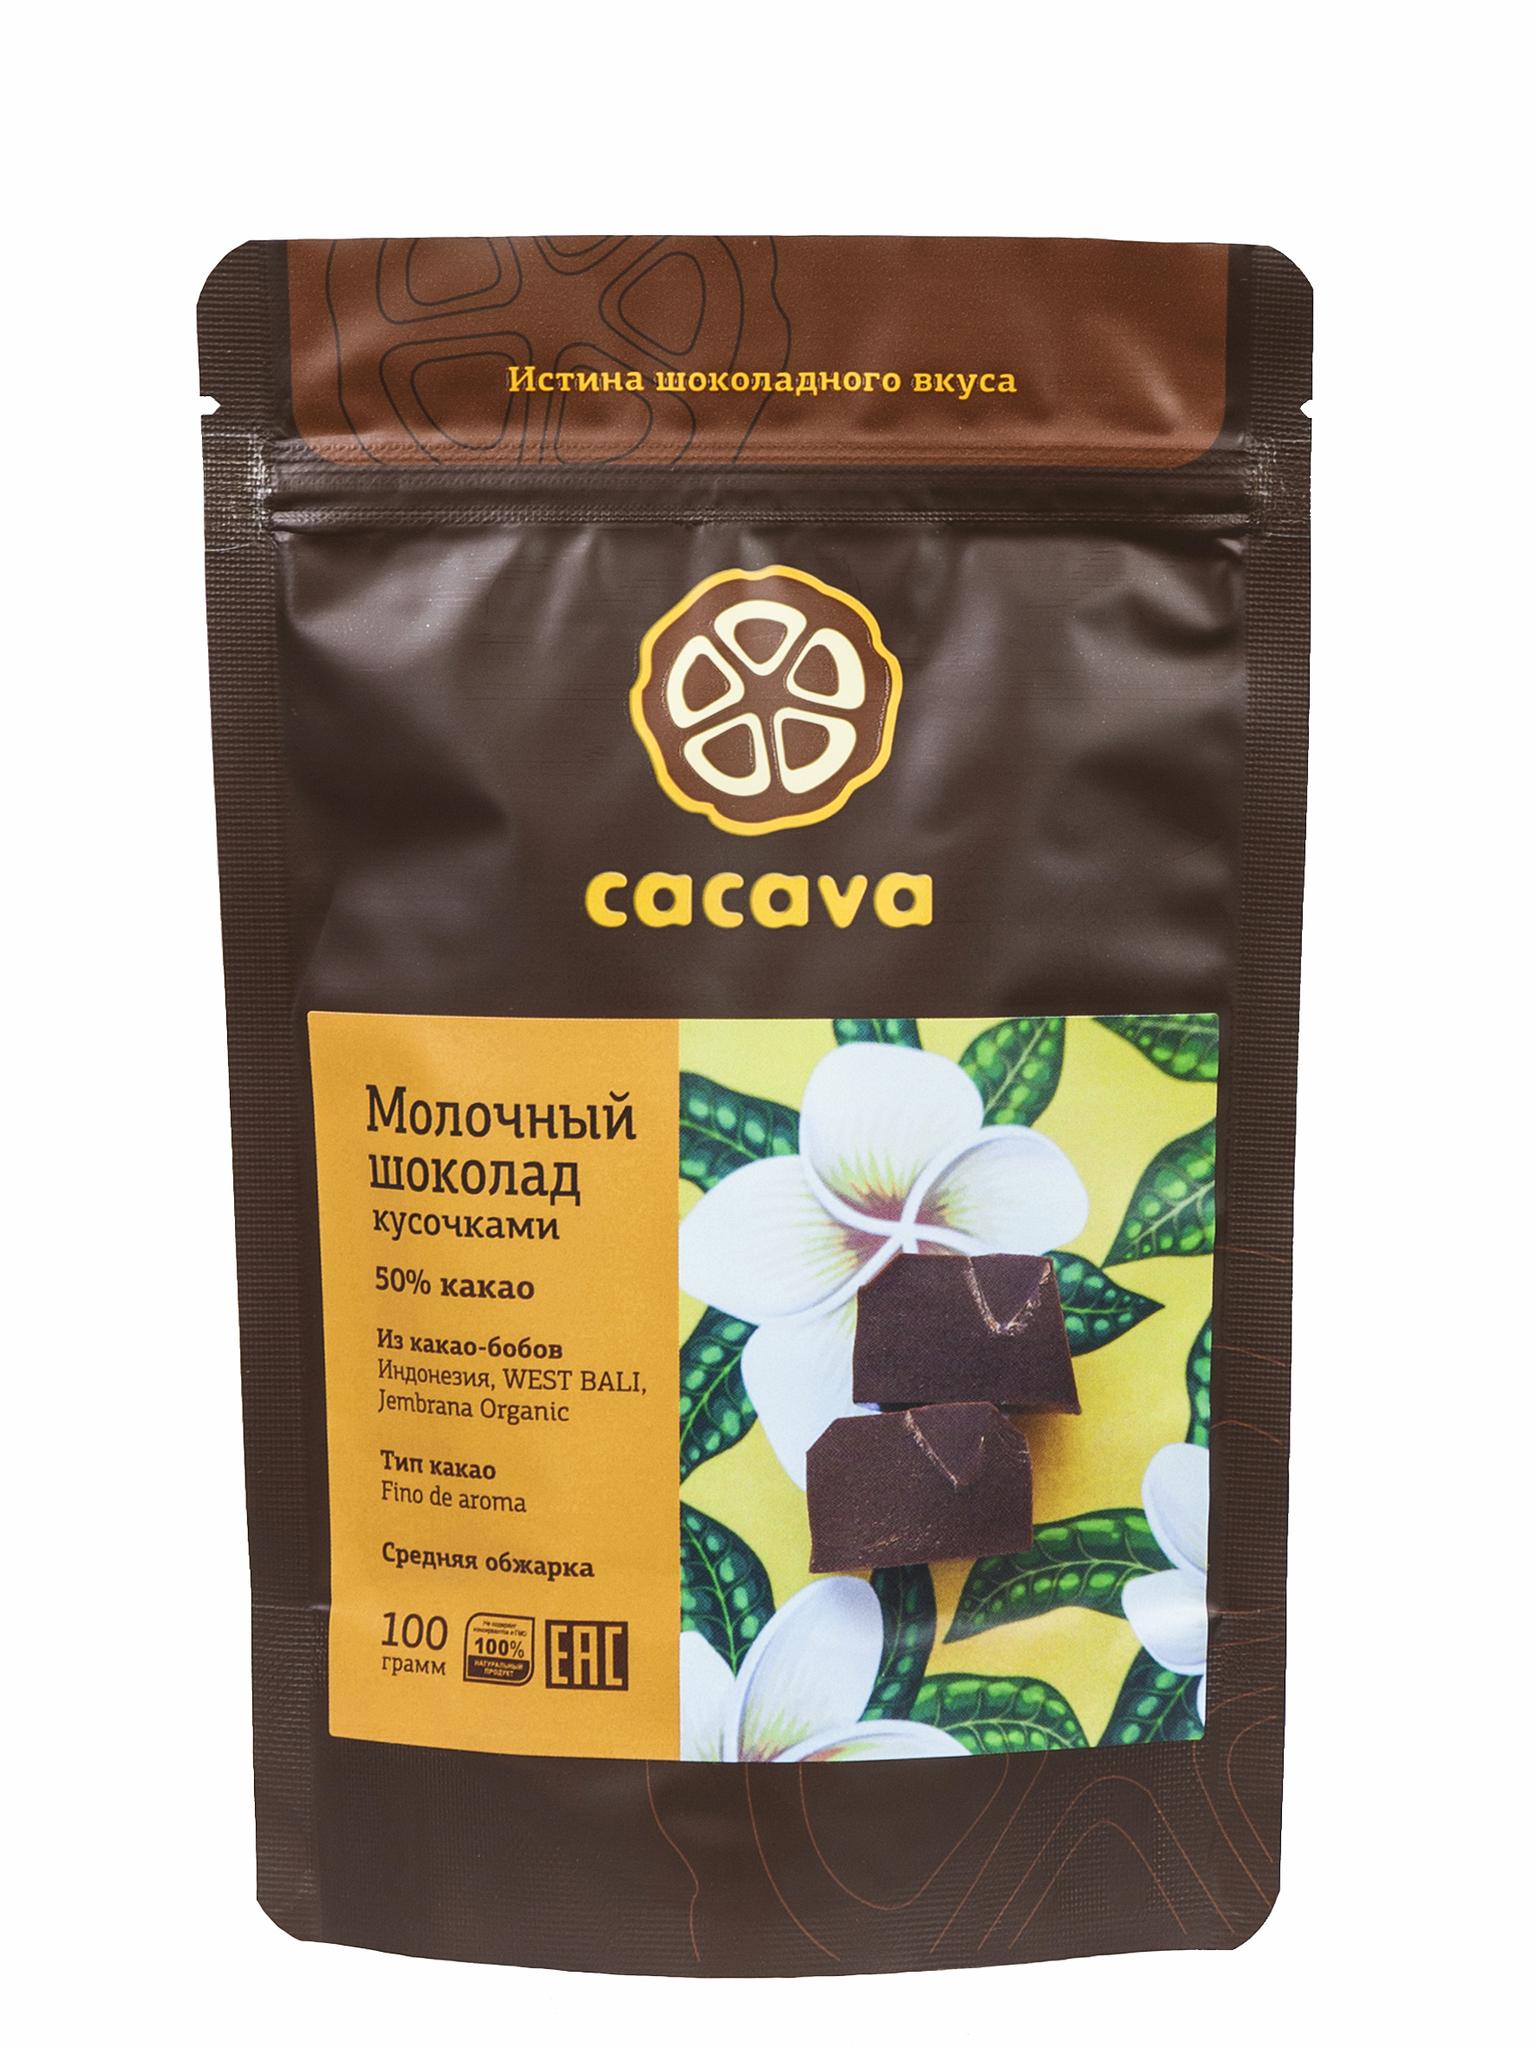 Молочный шоколад 50 % какао (Индонезия, WEST BALI, Jembrana), упаковка 100 грамм